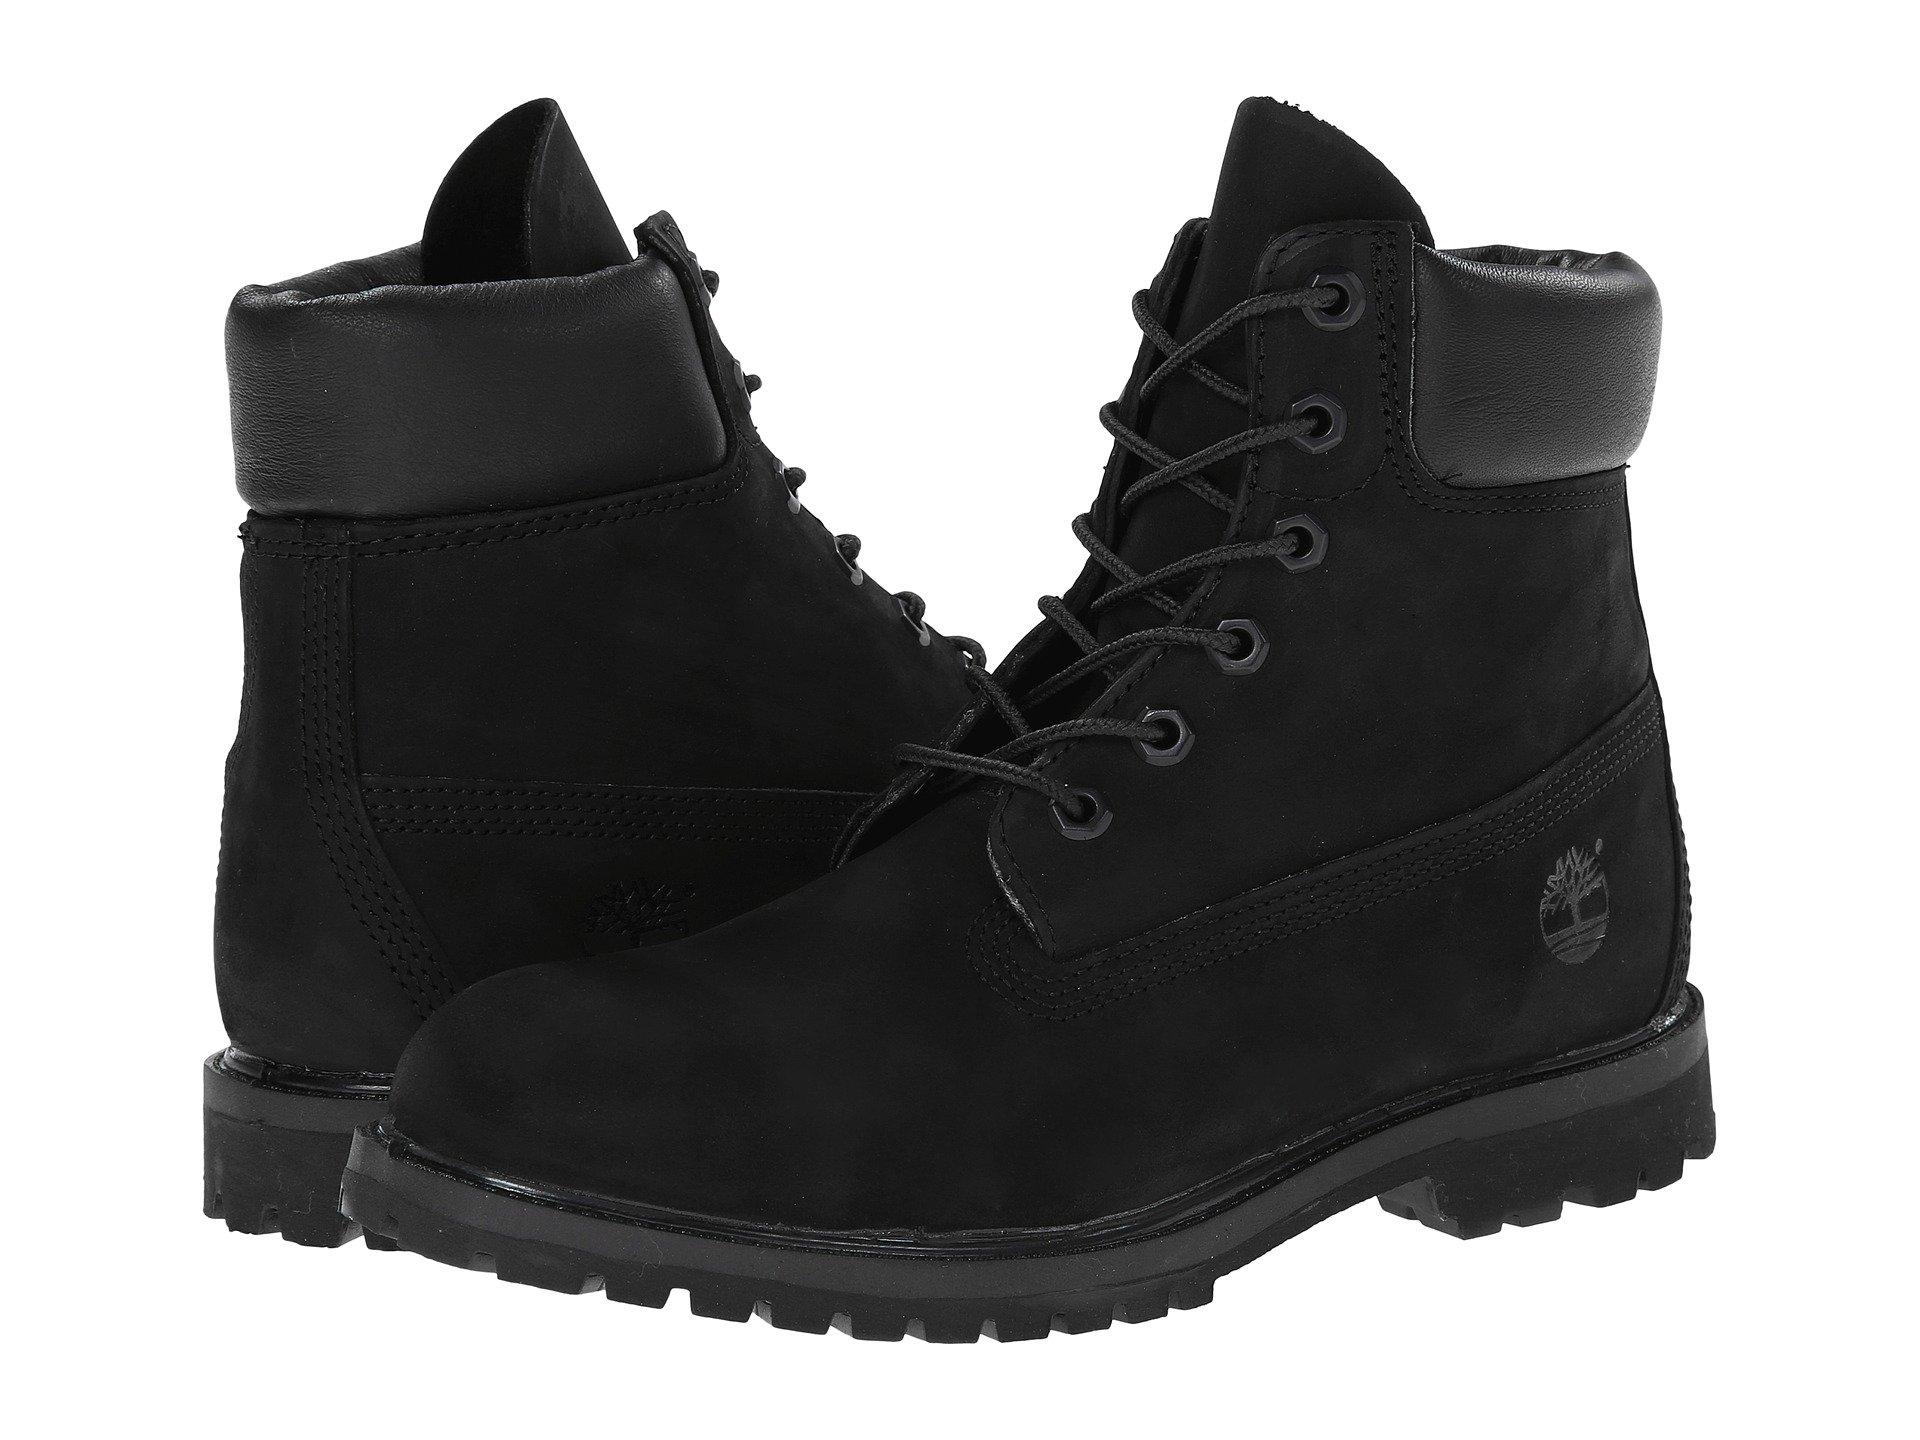 Timberland 6 Quot Premium Boot At Zappos Com